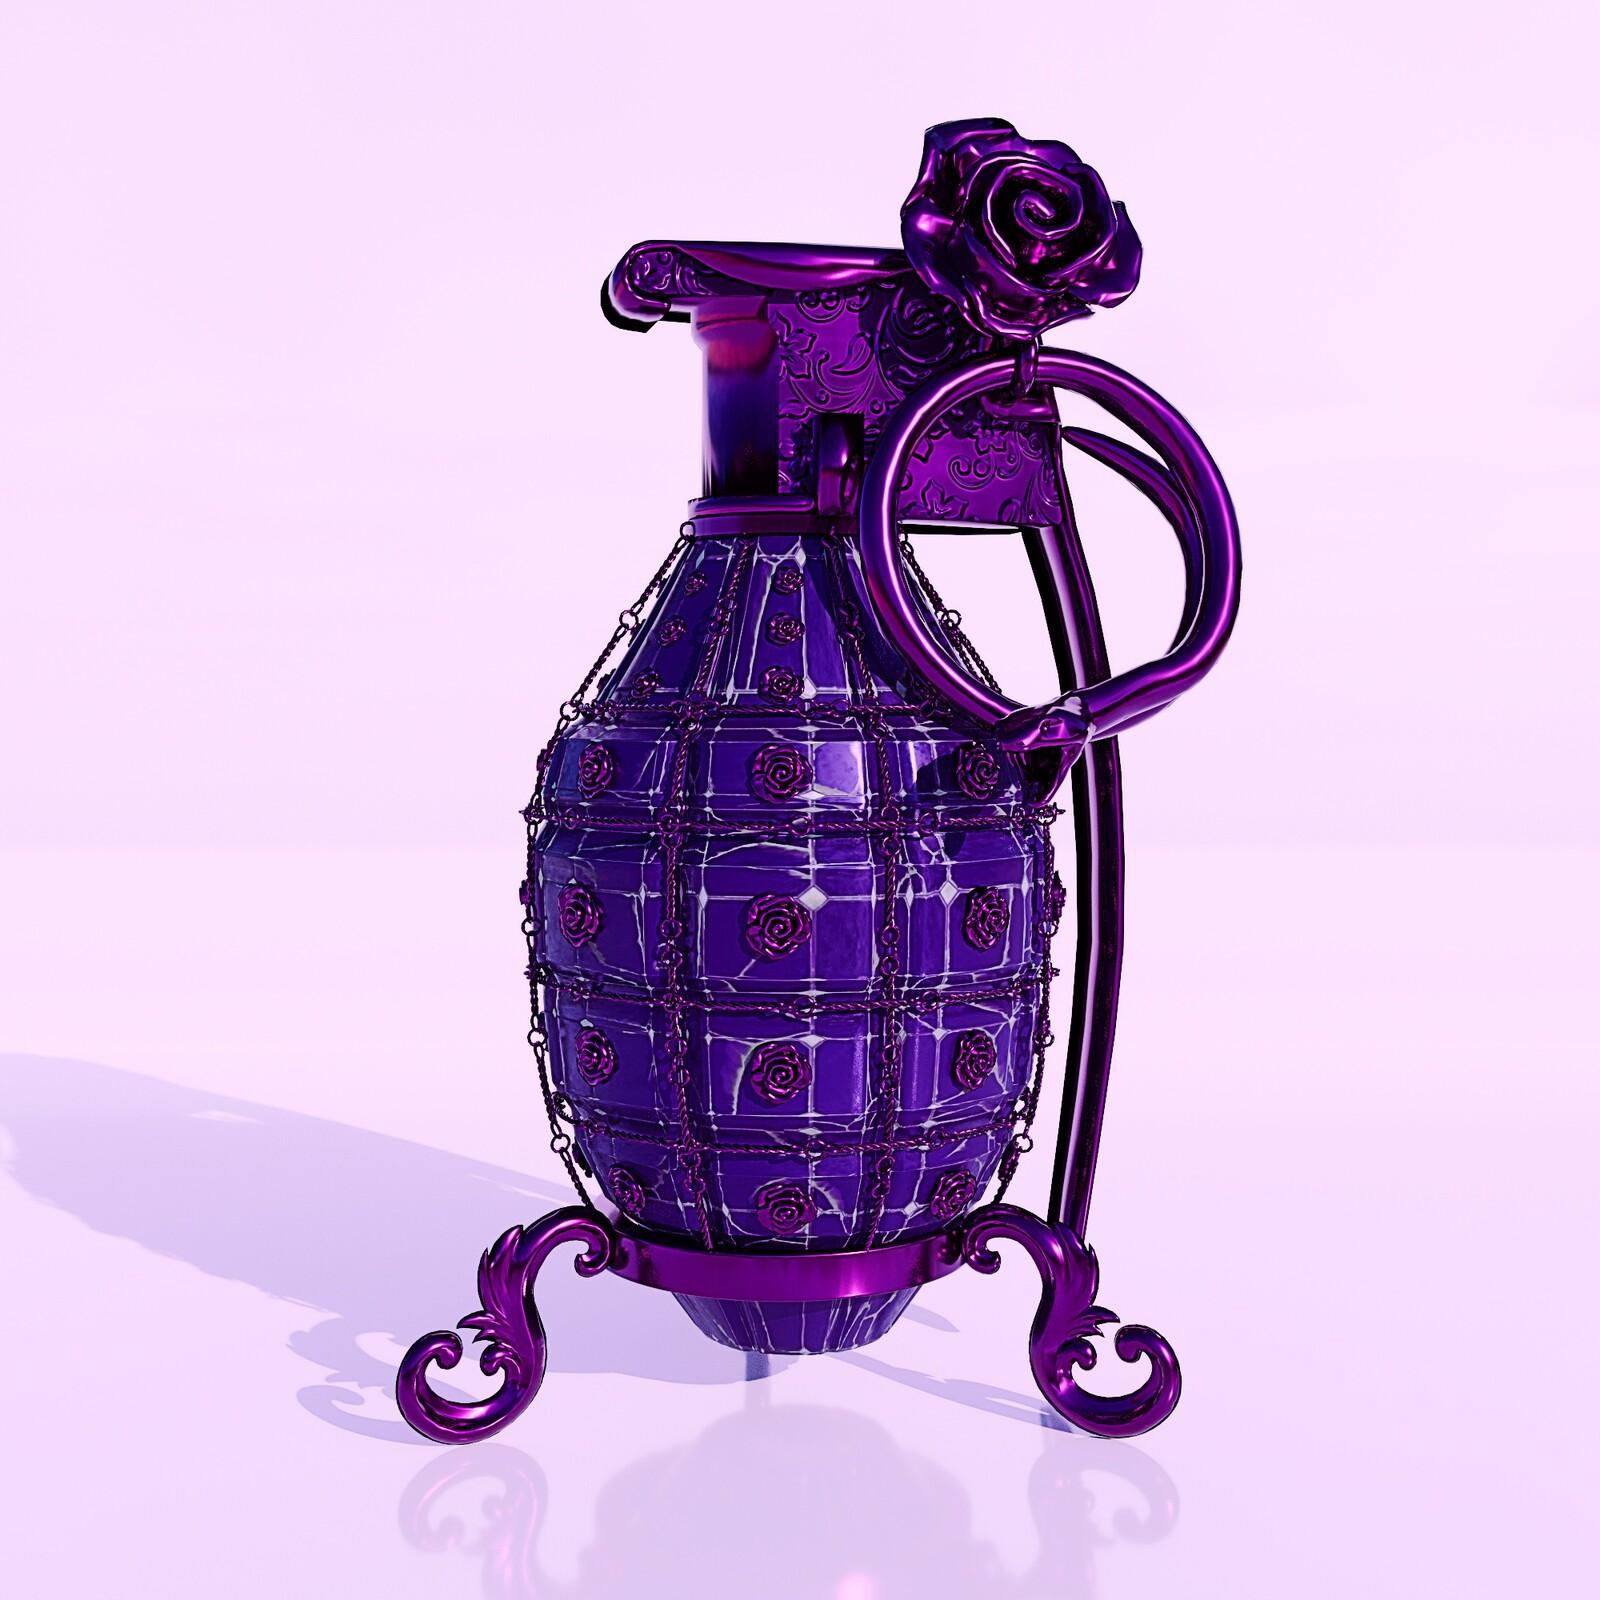 Pyrobolus Convenusto - Amethyst